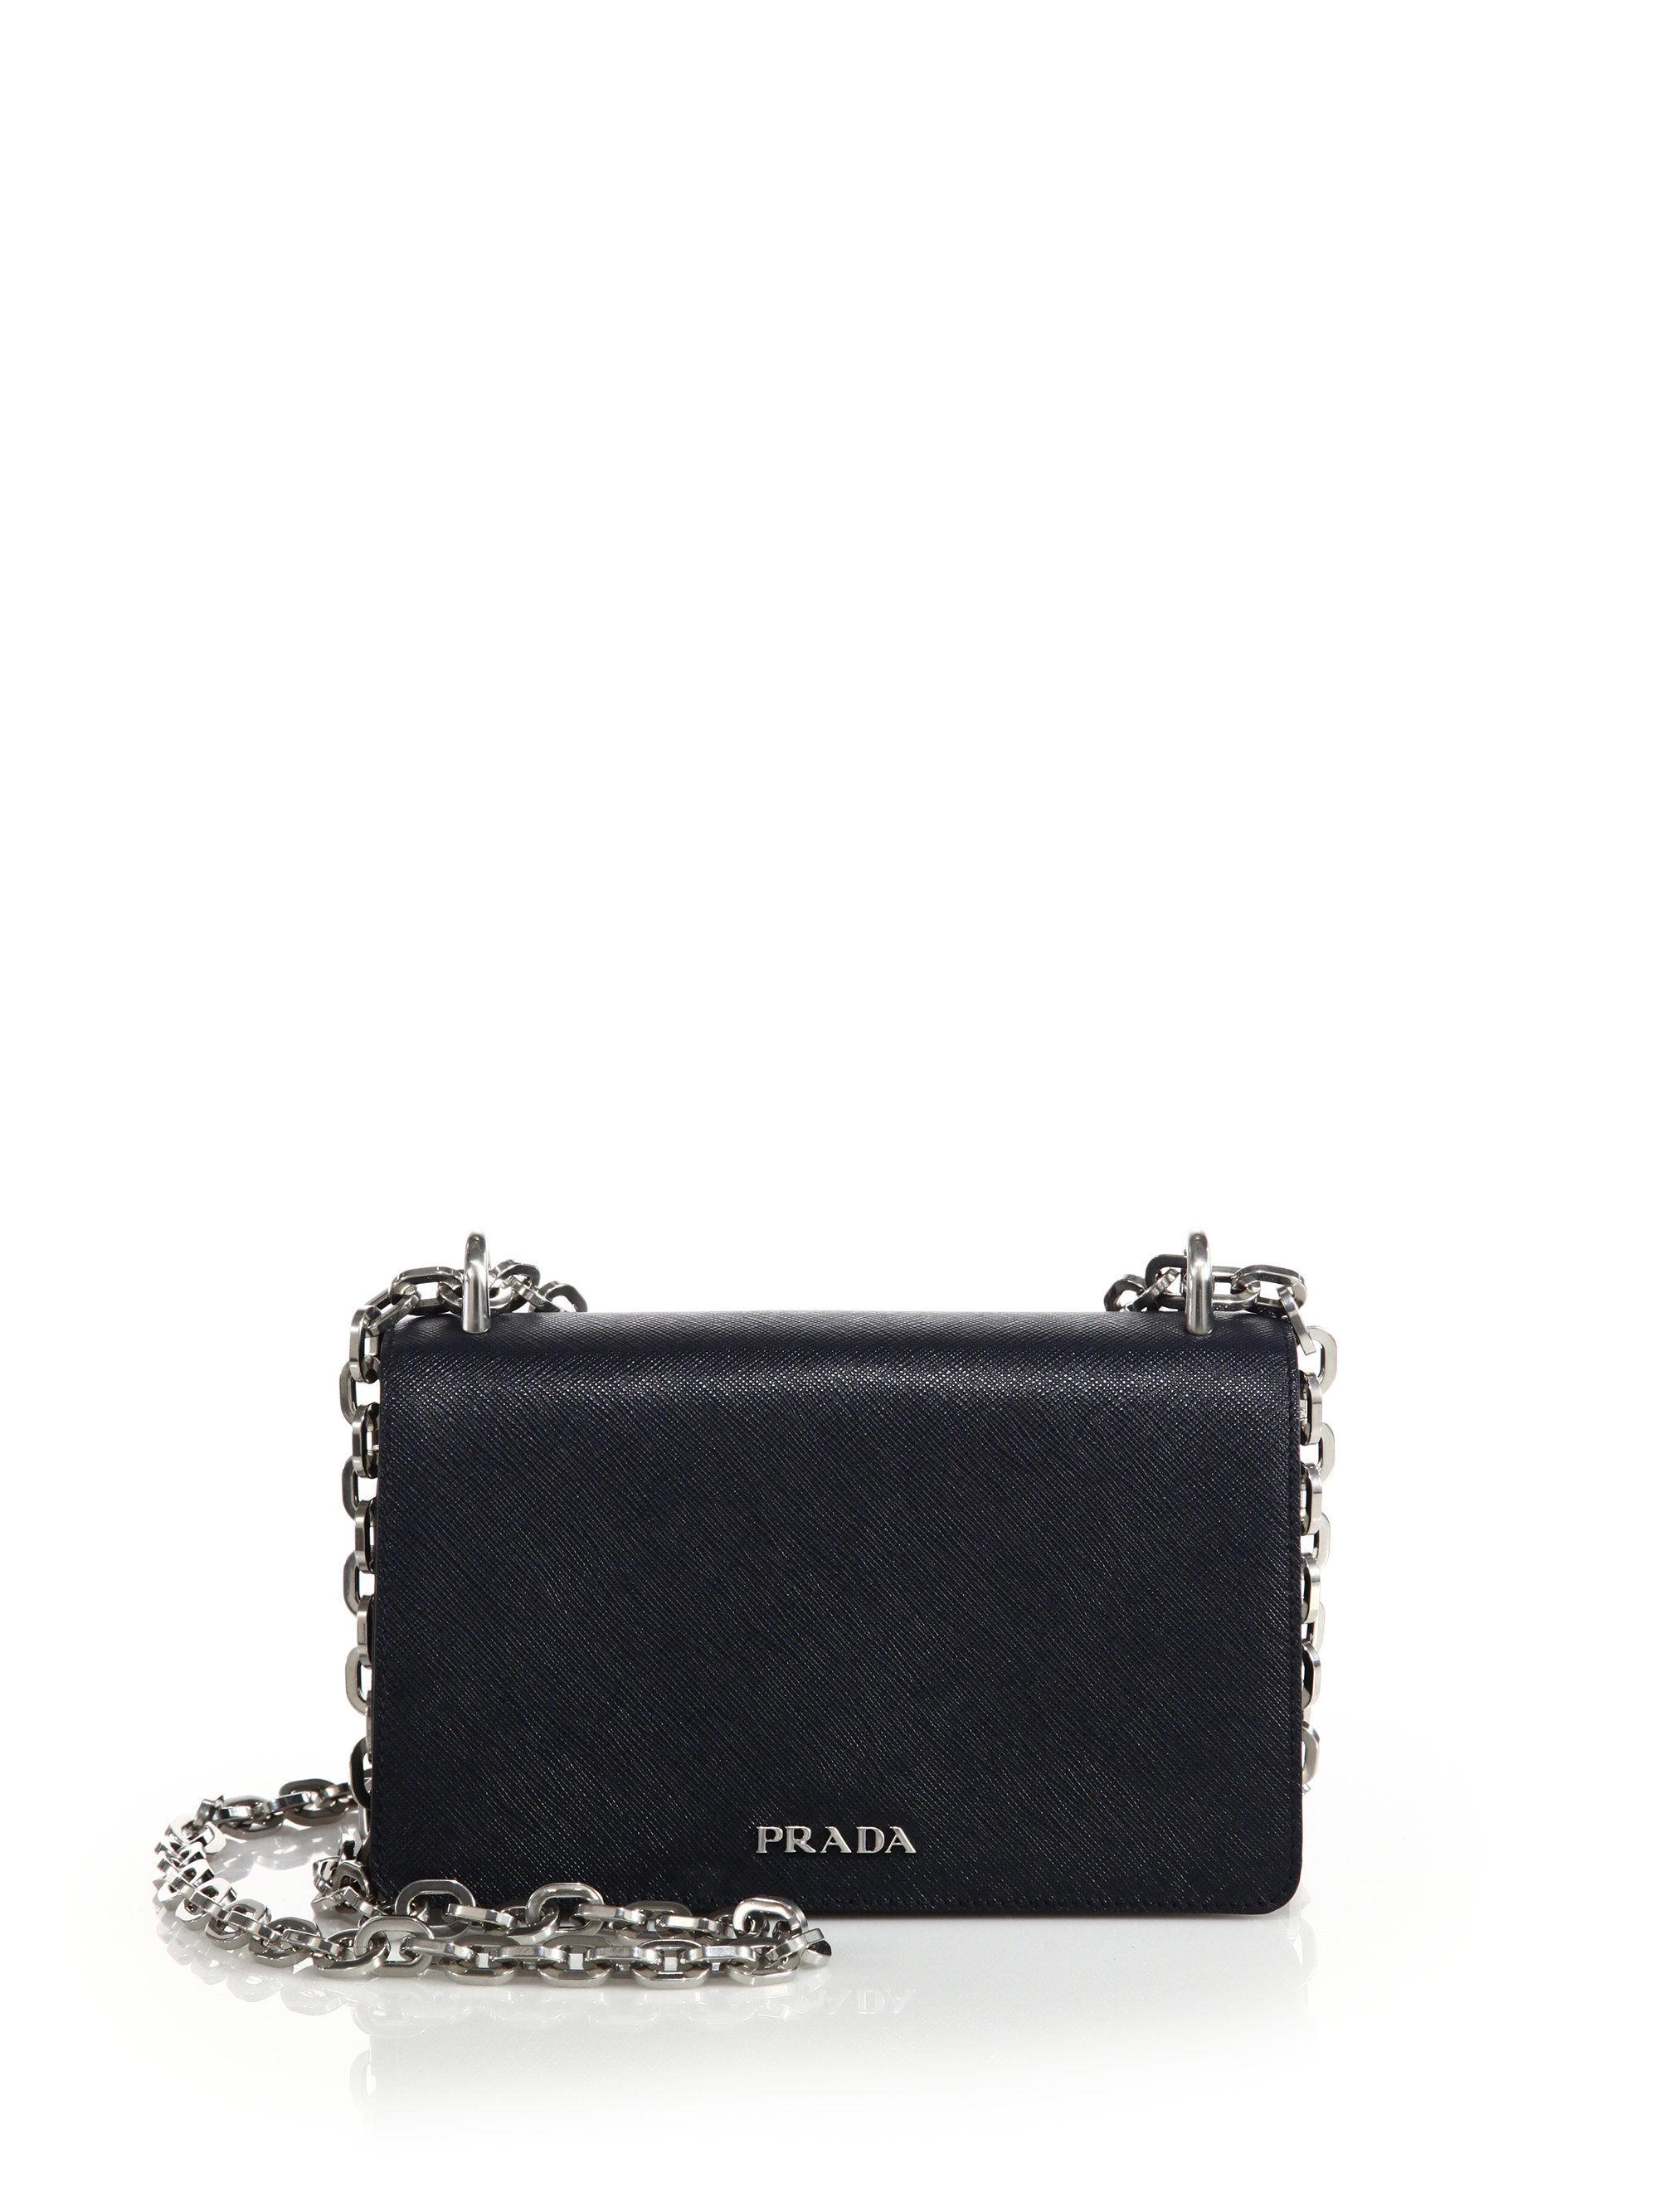 discount prada luggage - Prada Tessuto \u0026amp; Saffiano Bicolor Chain Bag in Blue | Lyst